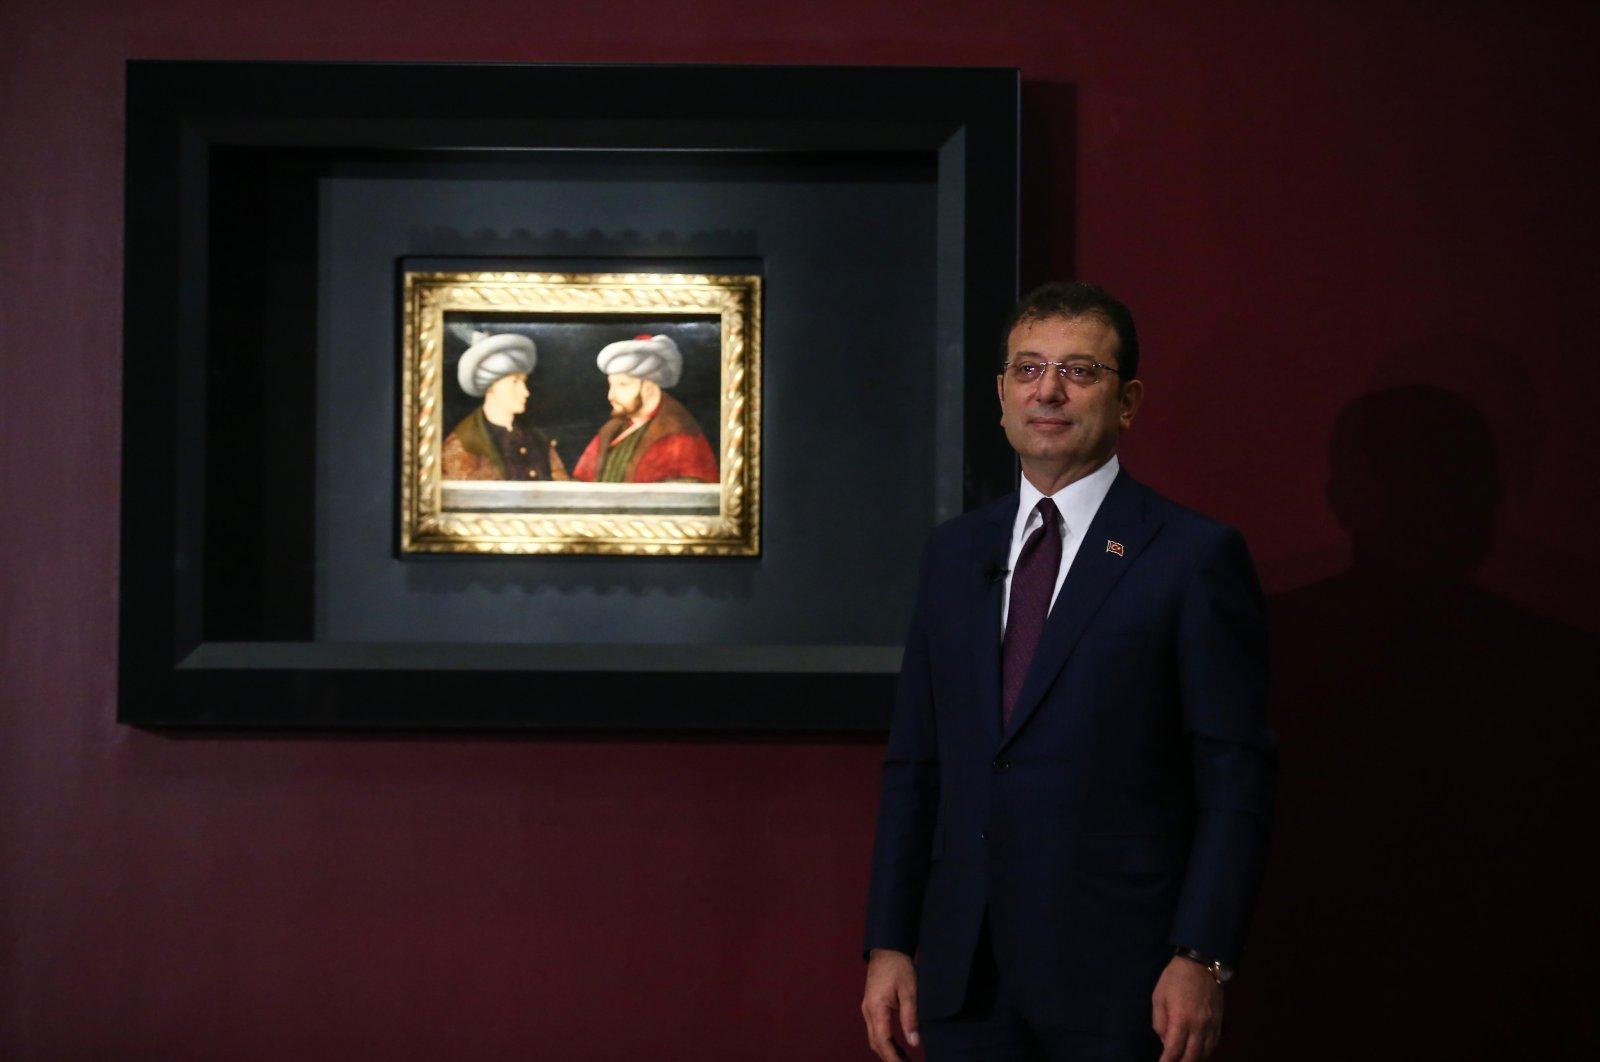 Mayor Ekrem Imamoğlu poses next to the portrait, in Istanbul, Turkey, Aug. 28, 2020. (AA Photo)